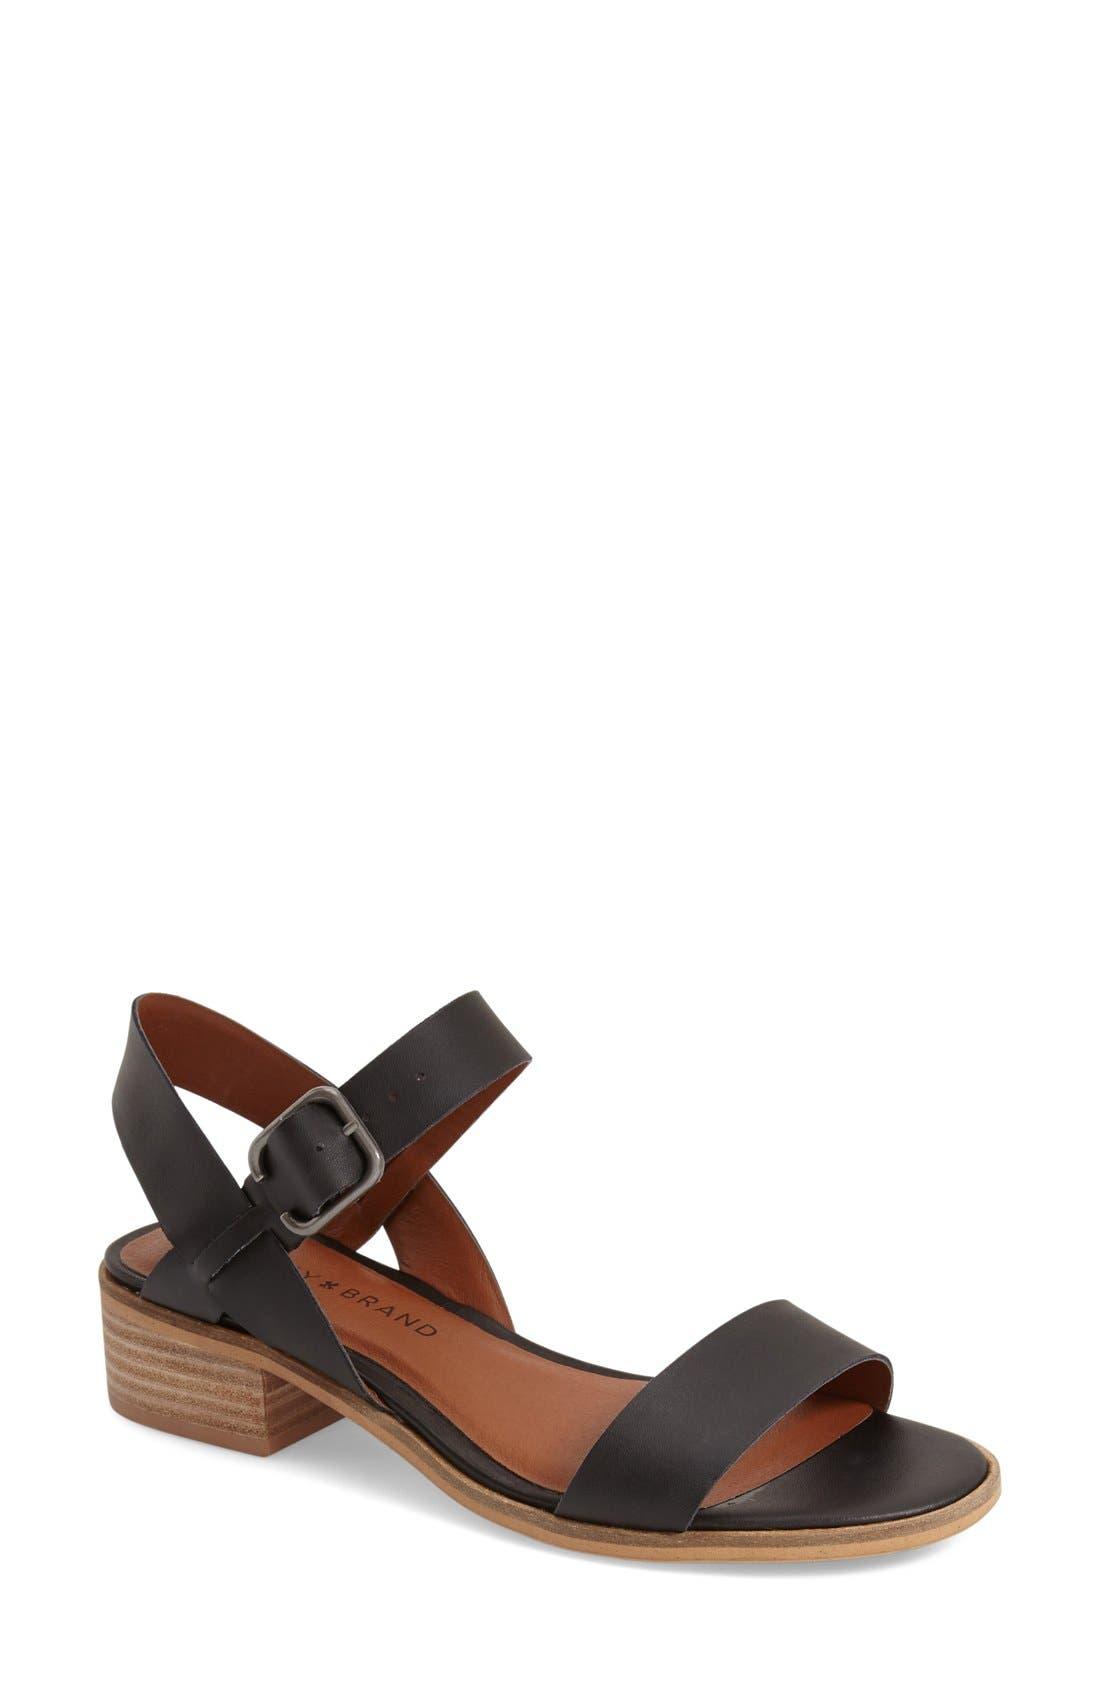 Alternate Image 1 Selected - Lucky Brand 'Toni' Stacked Heel Sandal (Women)